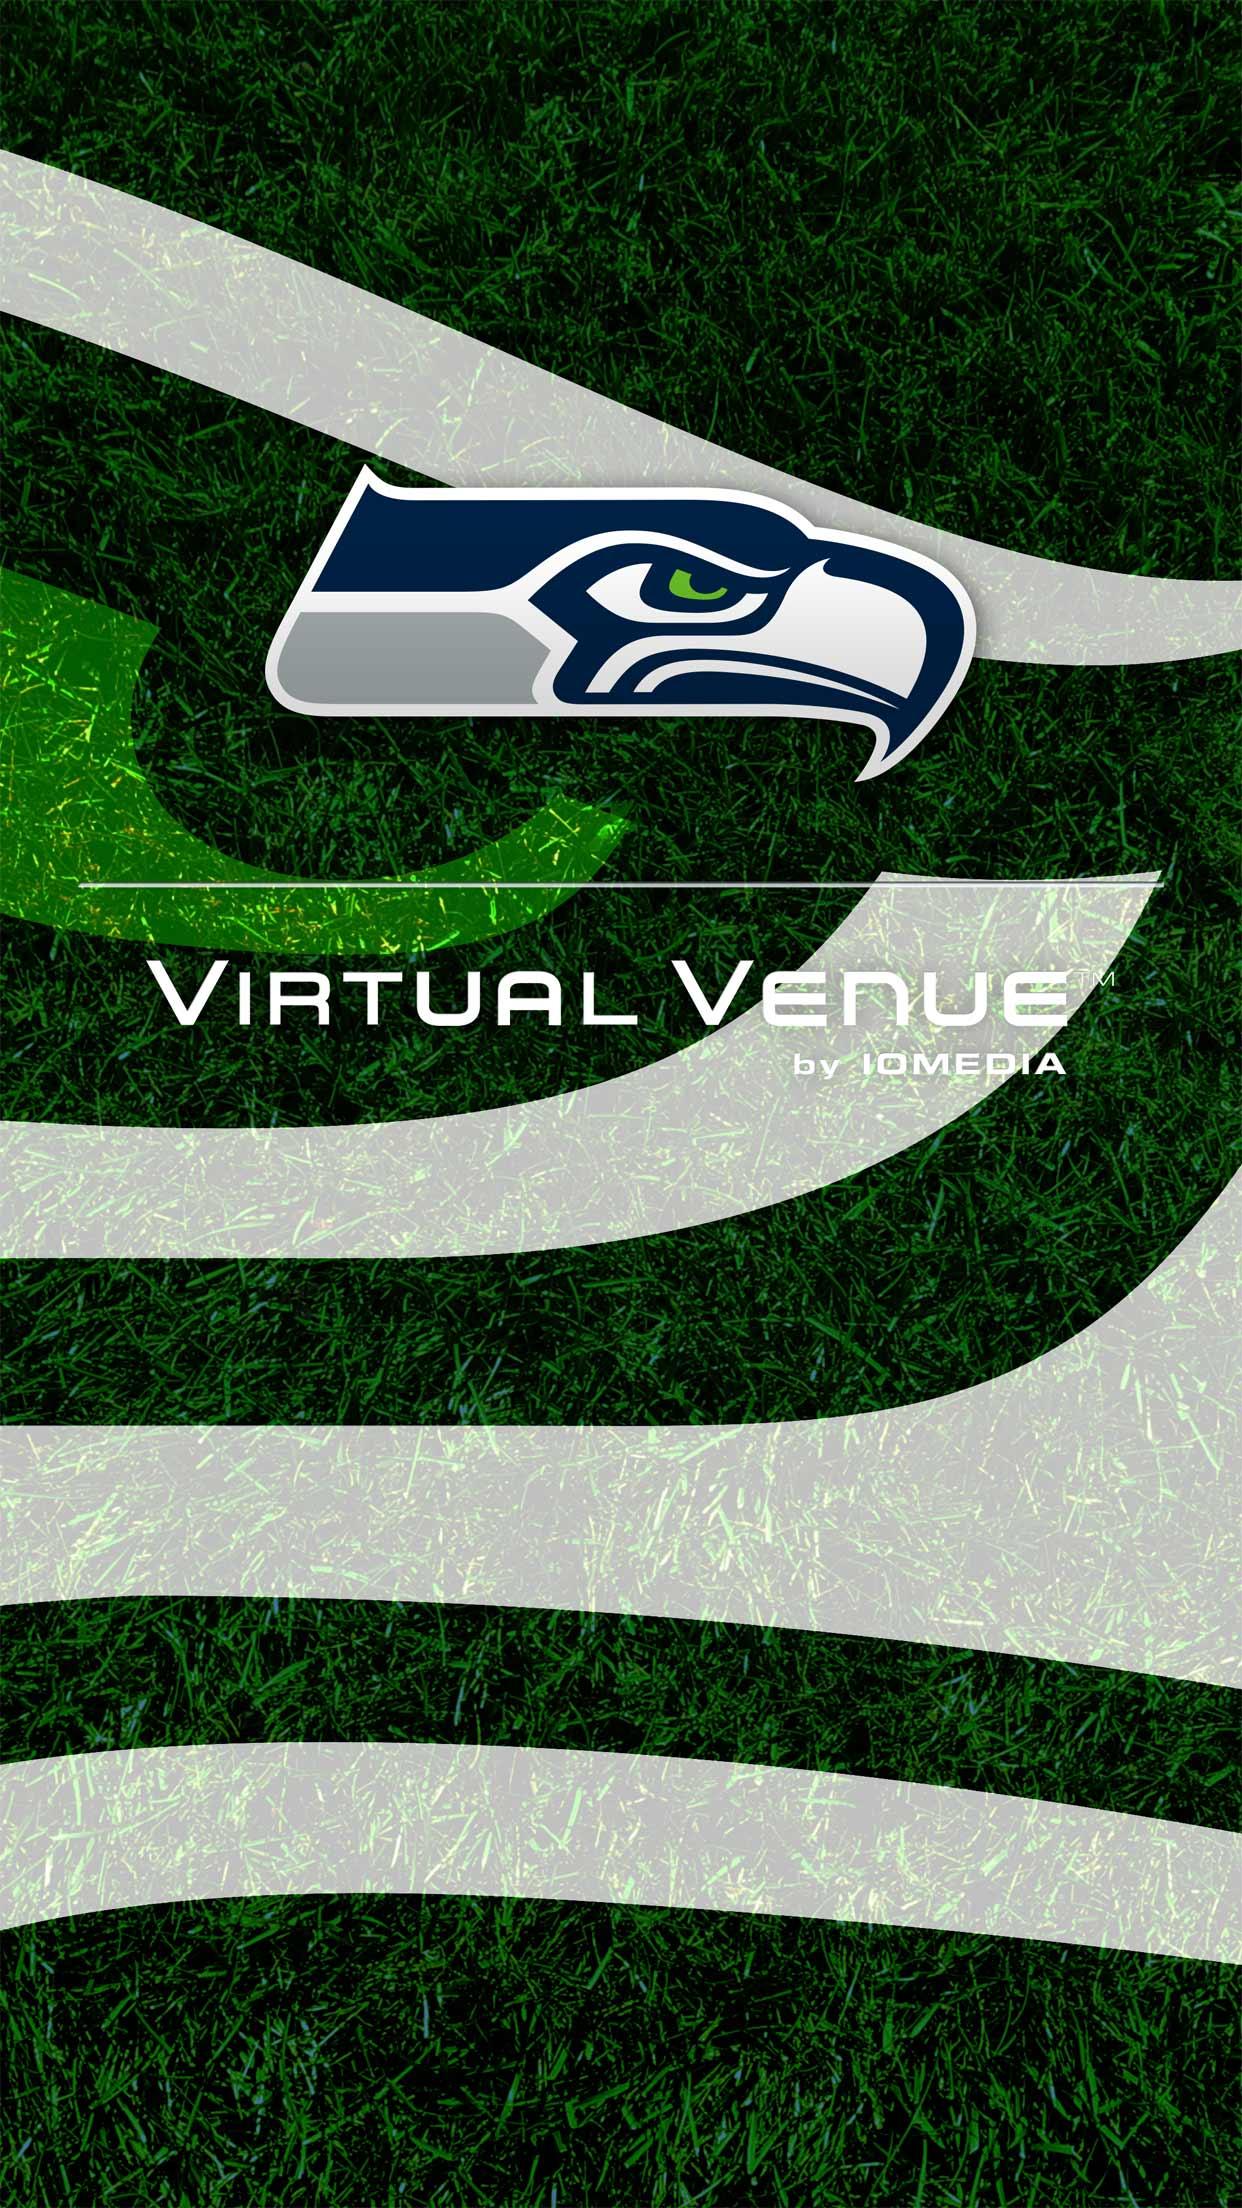 Seattle Seahawks Virtual Venue By Iomedia